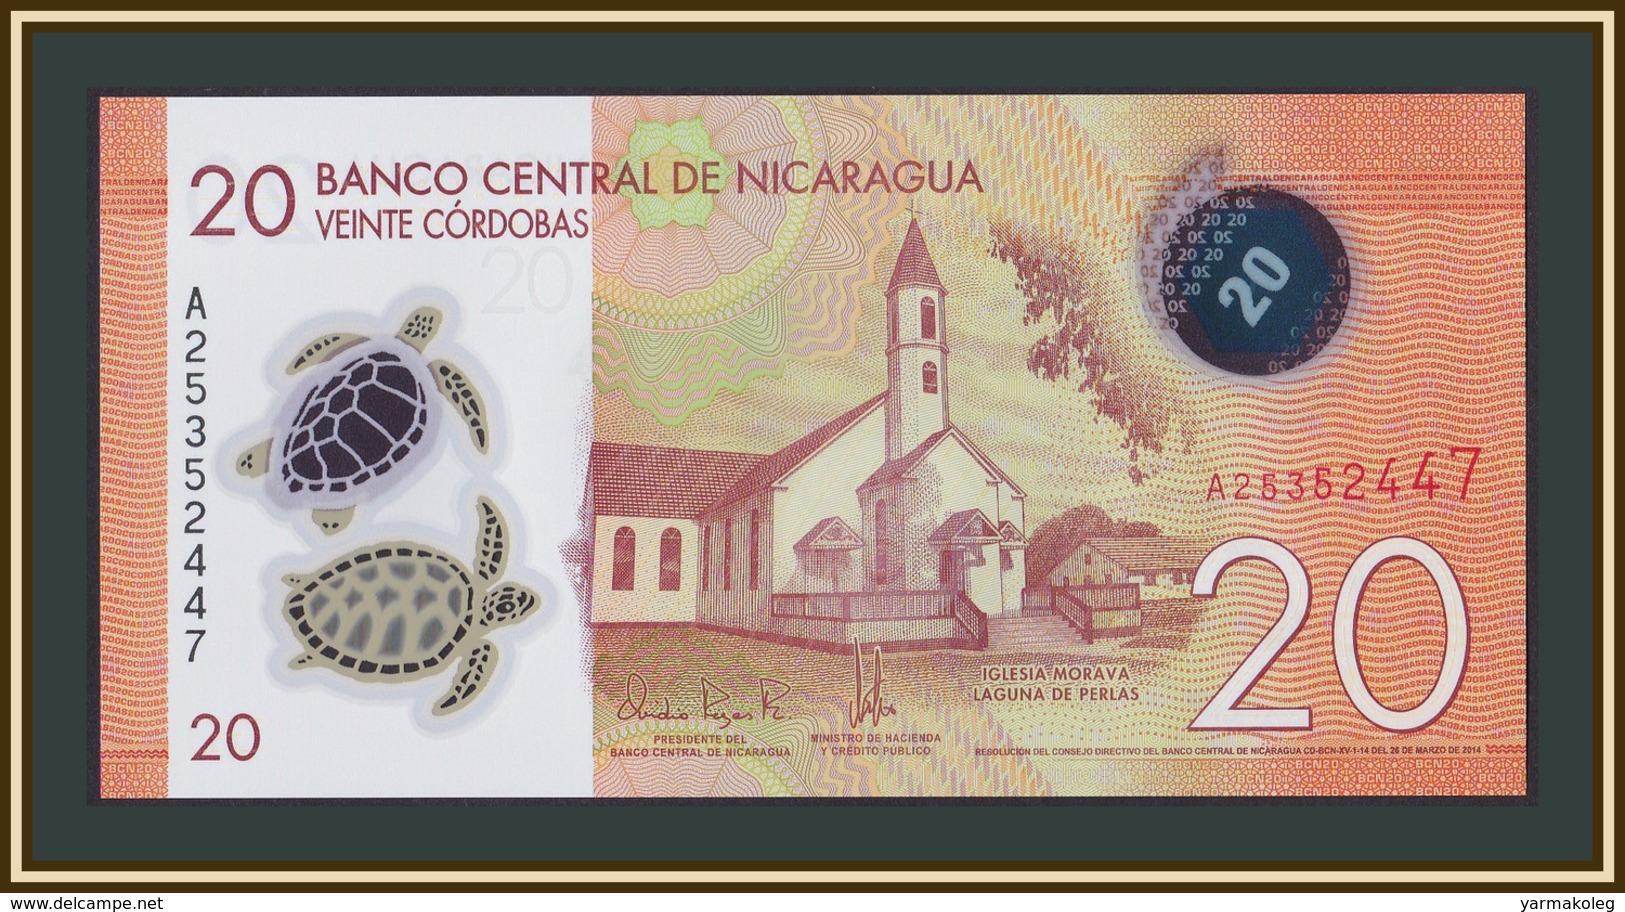 2015 Polymer//p211 UNC Nicaragua 50 Cテウrdobas